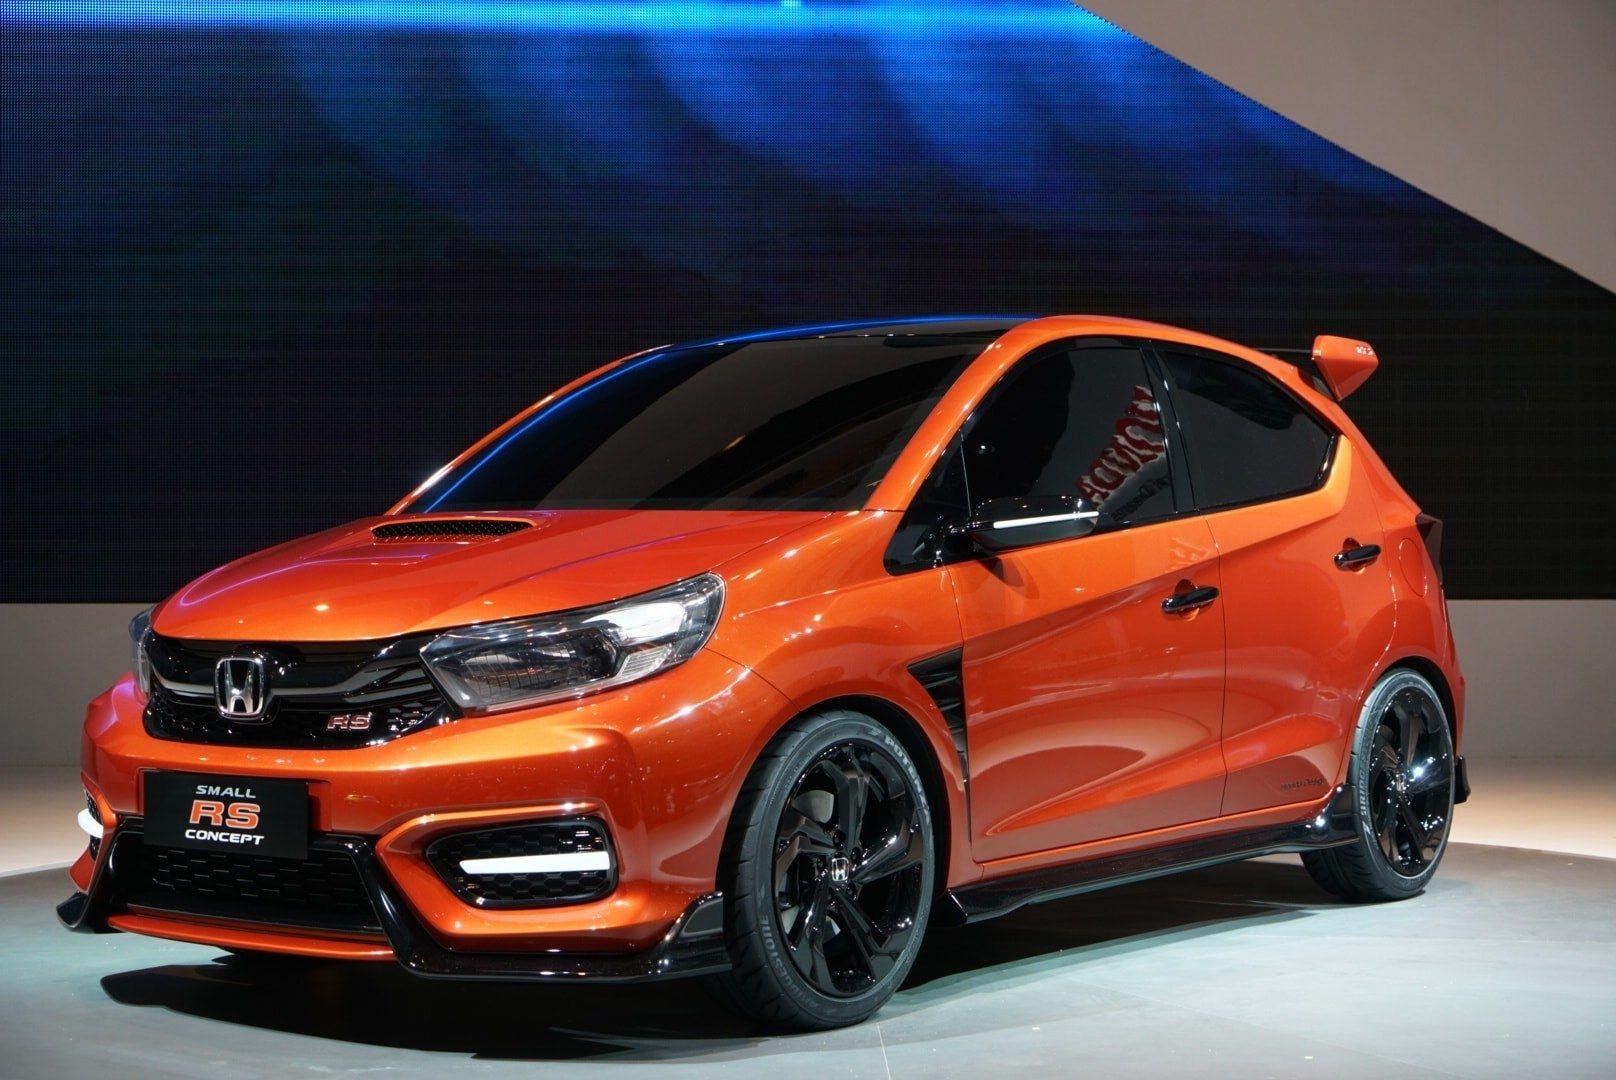 Nouveau 2020 Honda Brio Honda brio, Honda, New honda